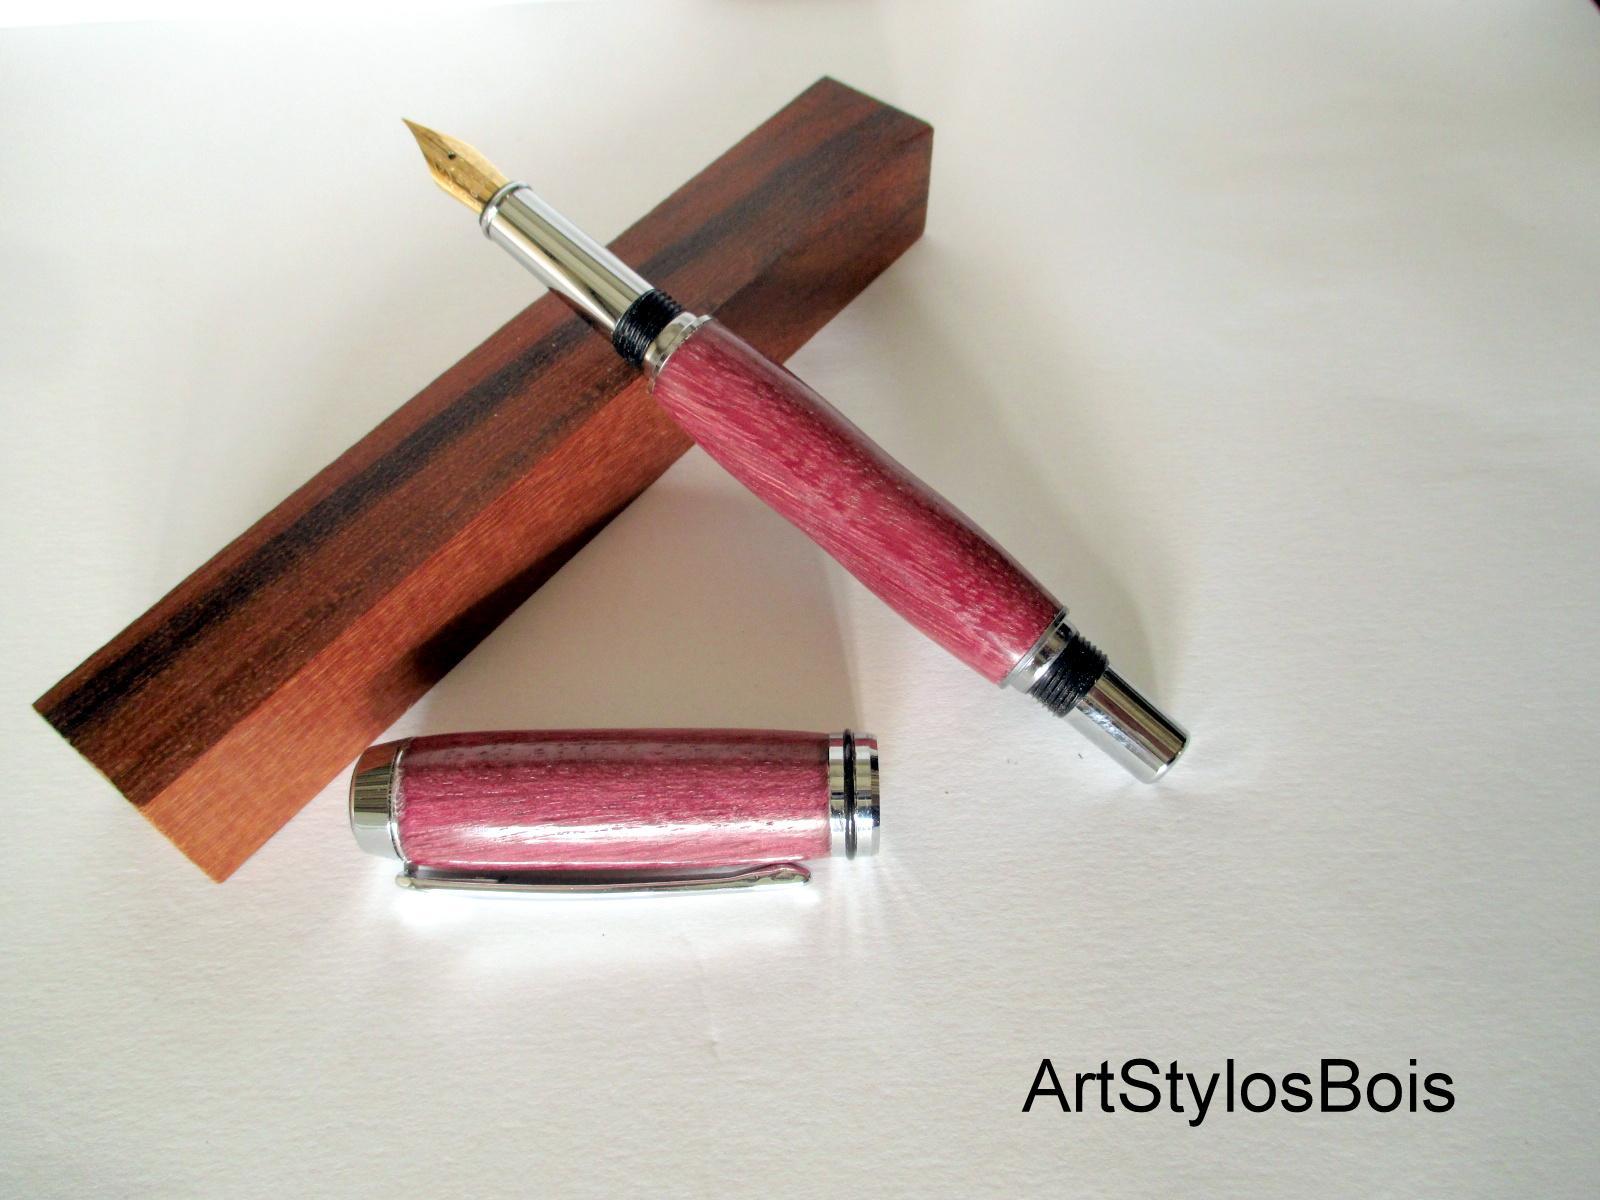 Stylo plume en bois d'Amaranthe